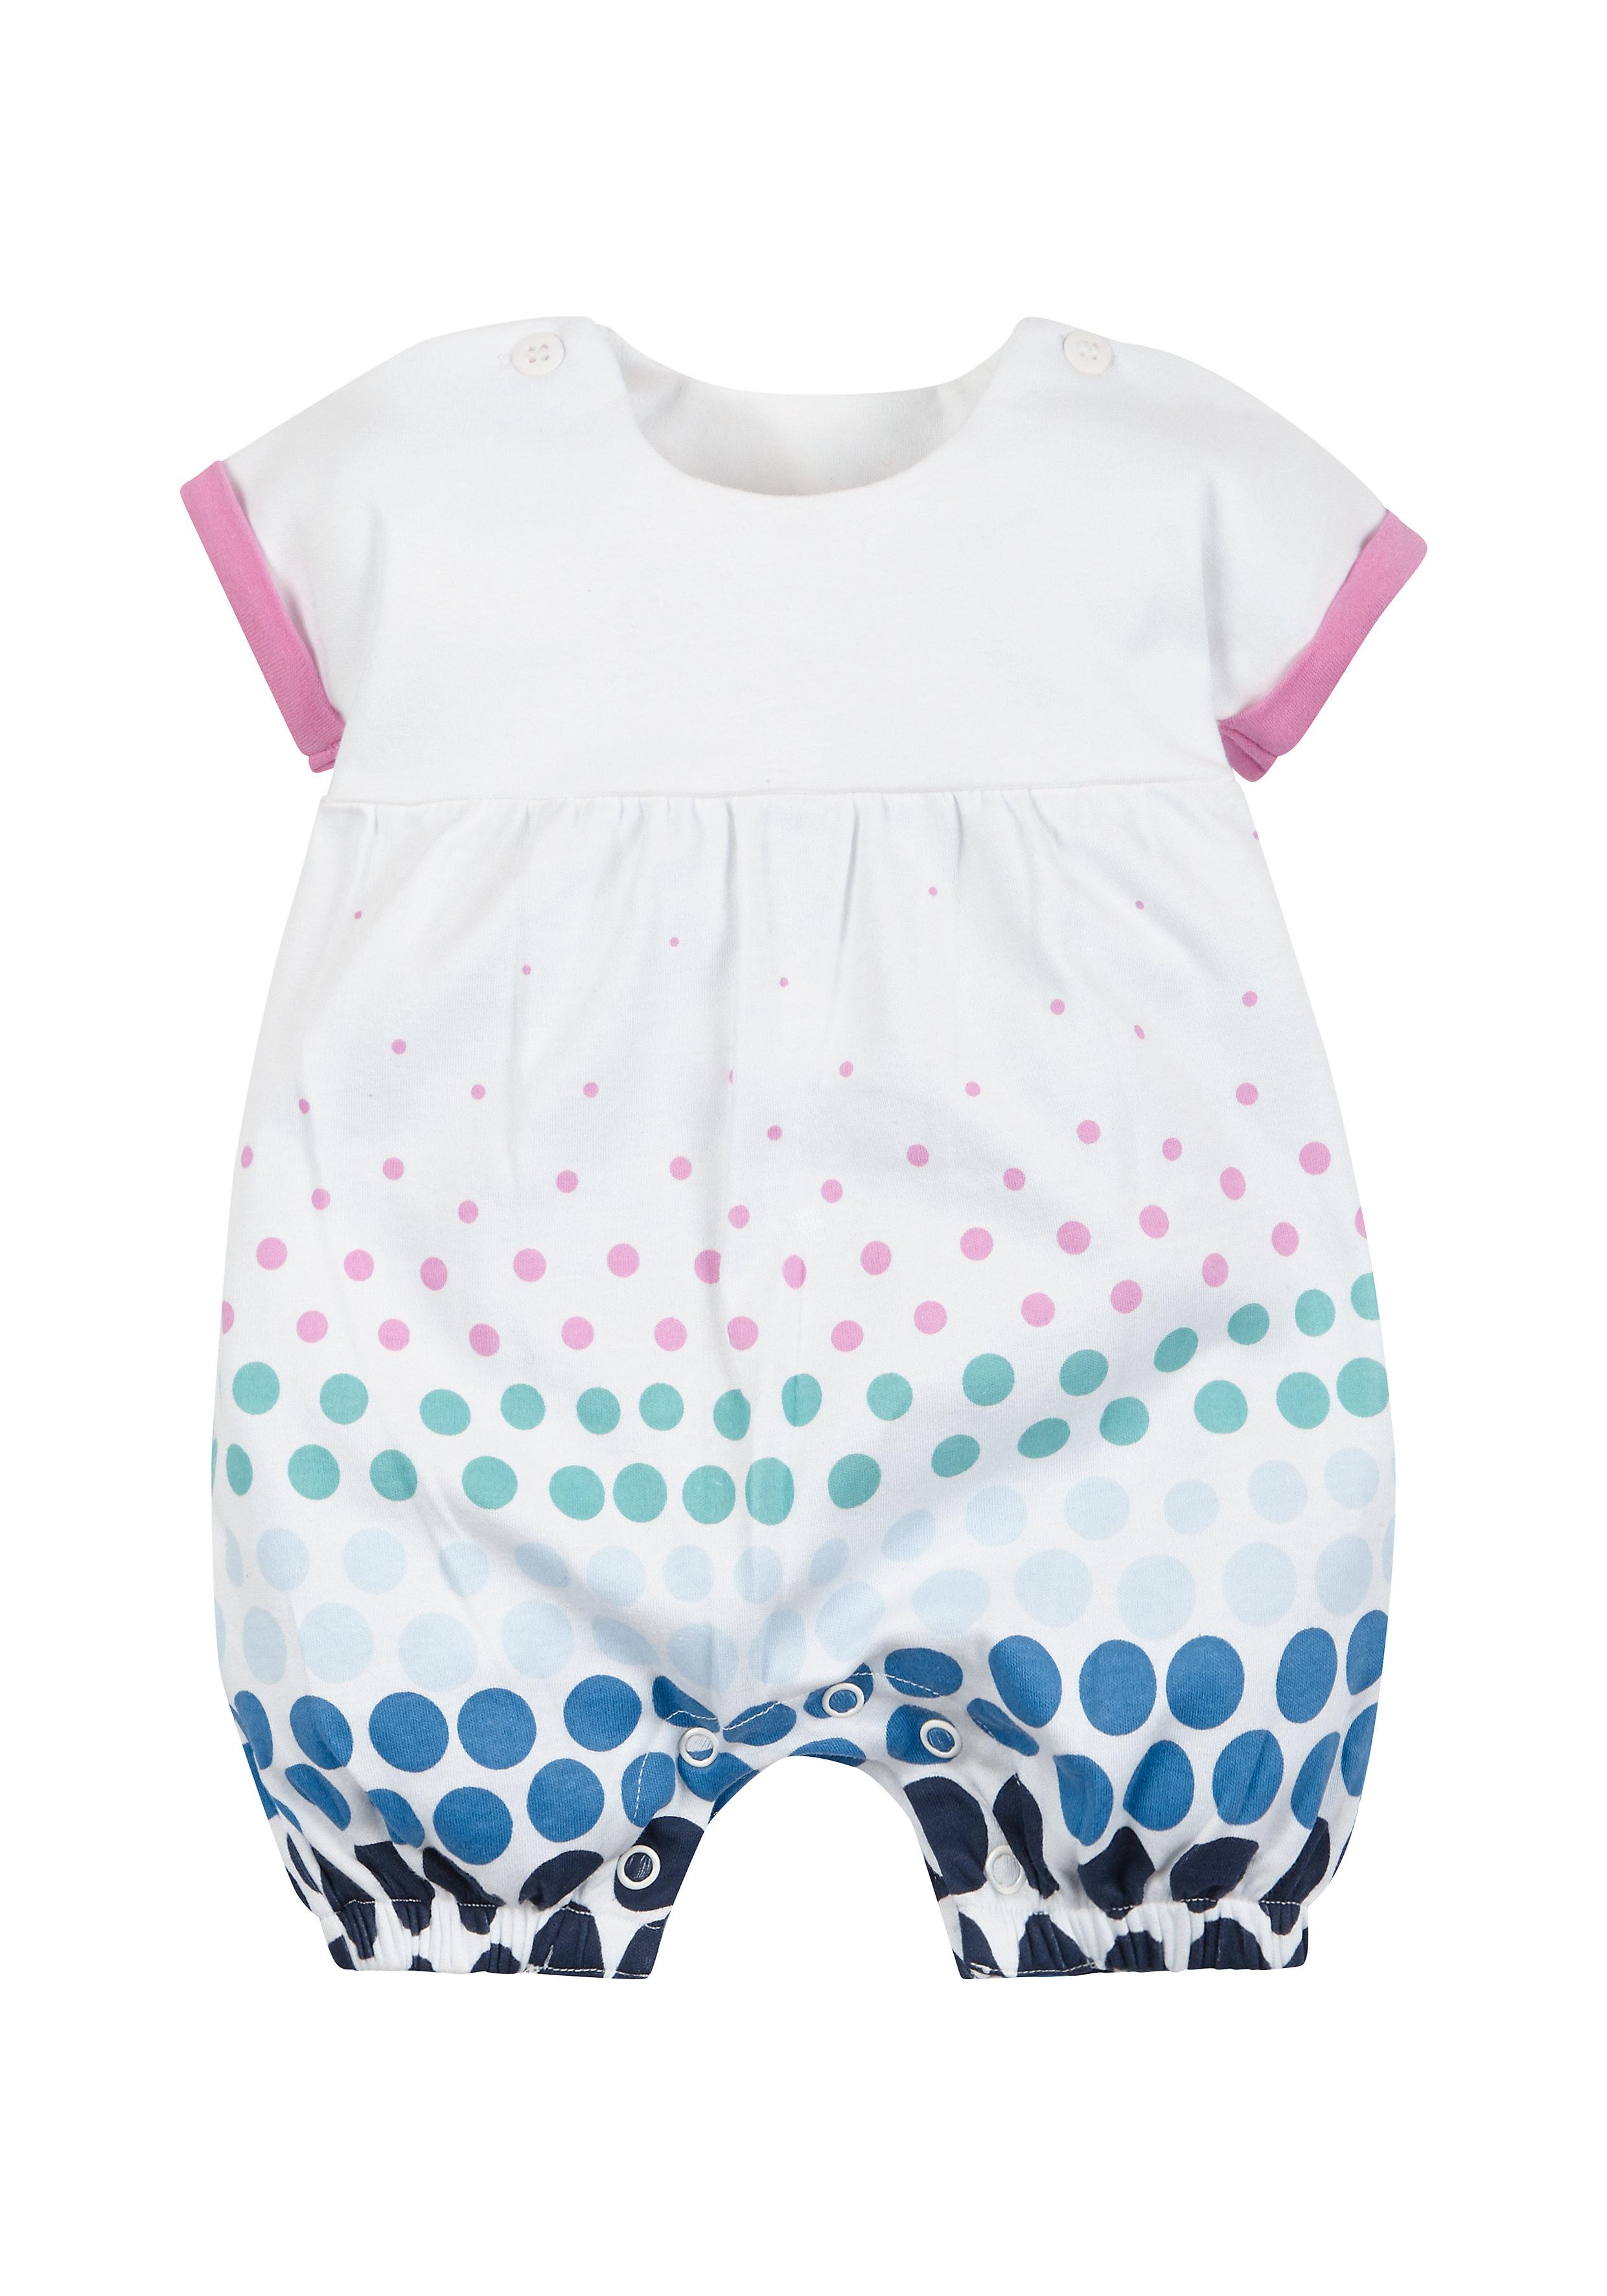 Mothercare | Girls Spotty Print Romper